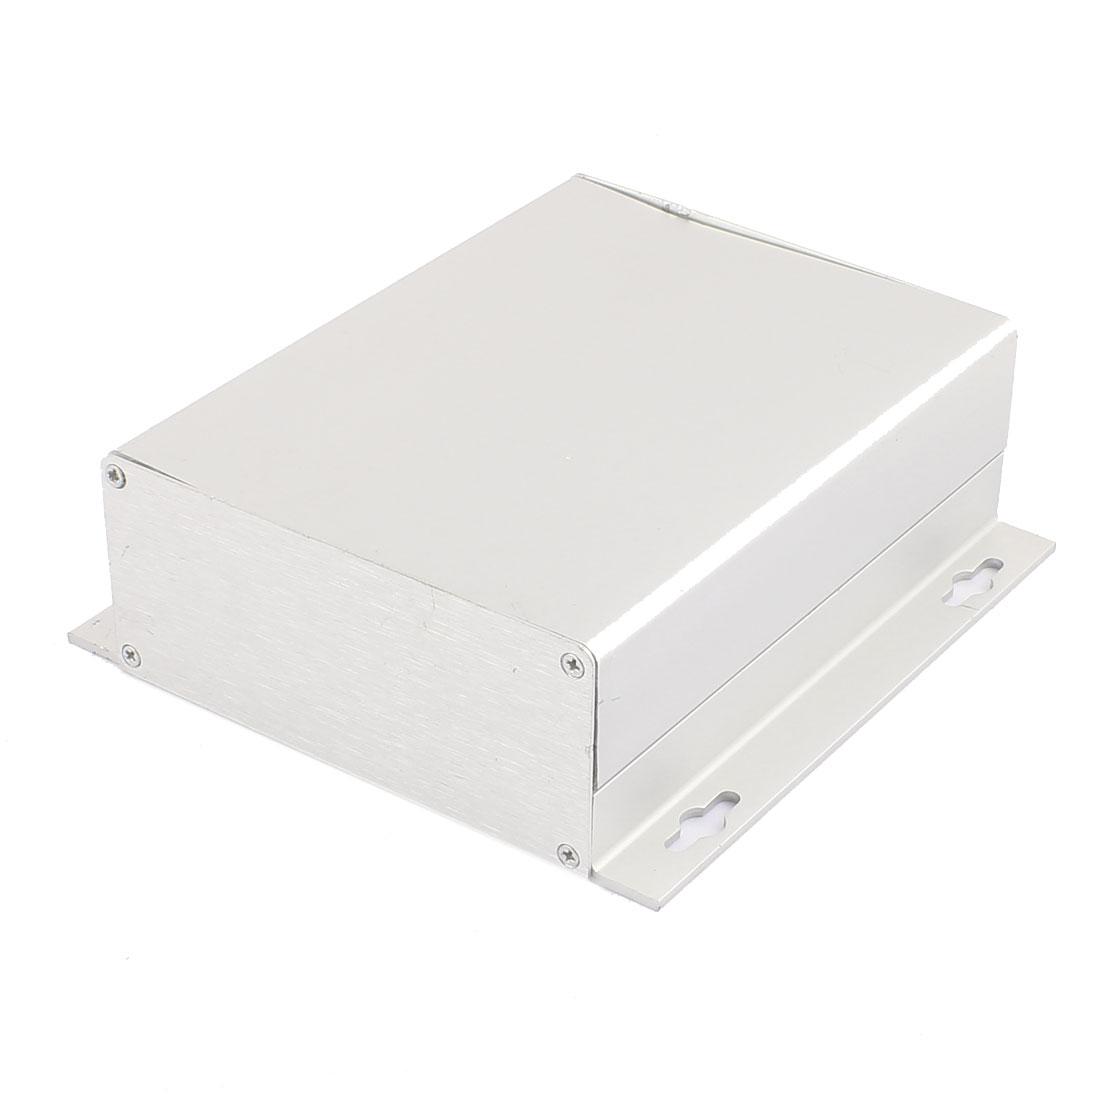 158 x 150 x 52mm Multi-purpose Electronic Extruded Aluminum Enclosure Silver Tone